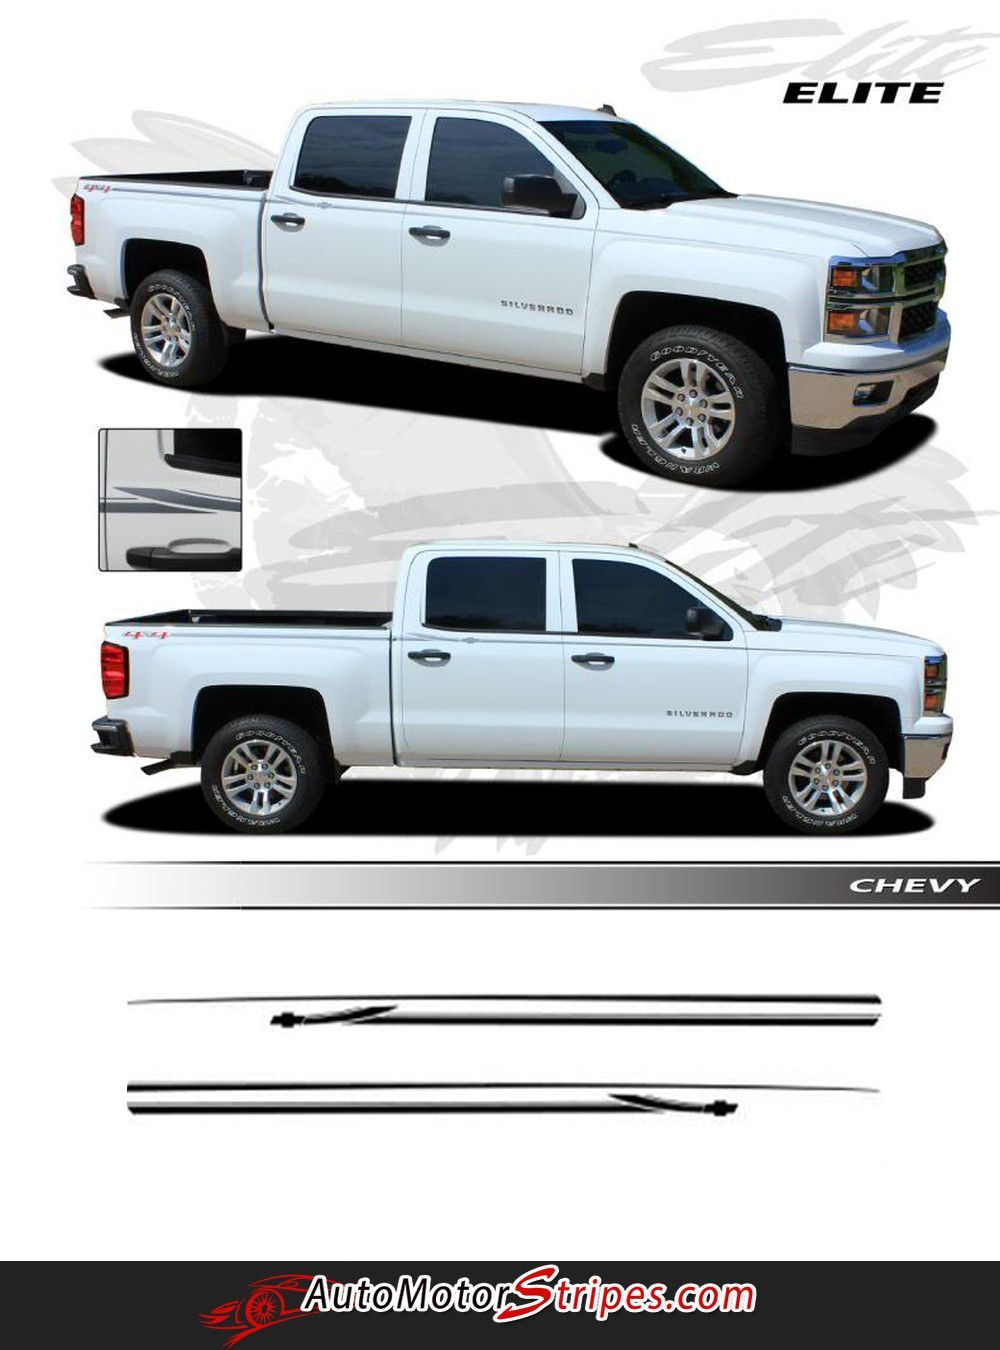 2013 2016 chevy silverado elite truck upper side body pin striping accent vinyl graphics 3m